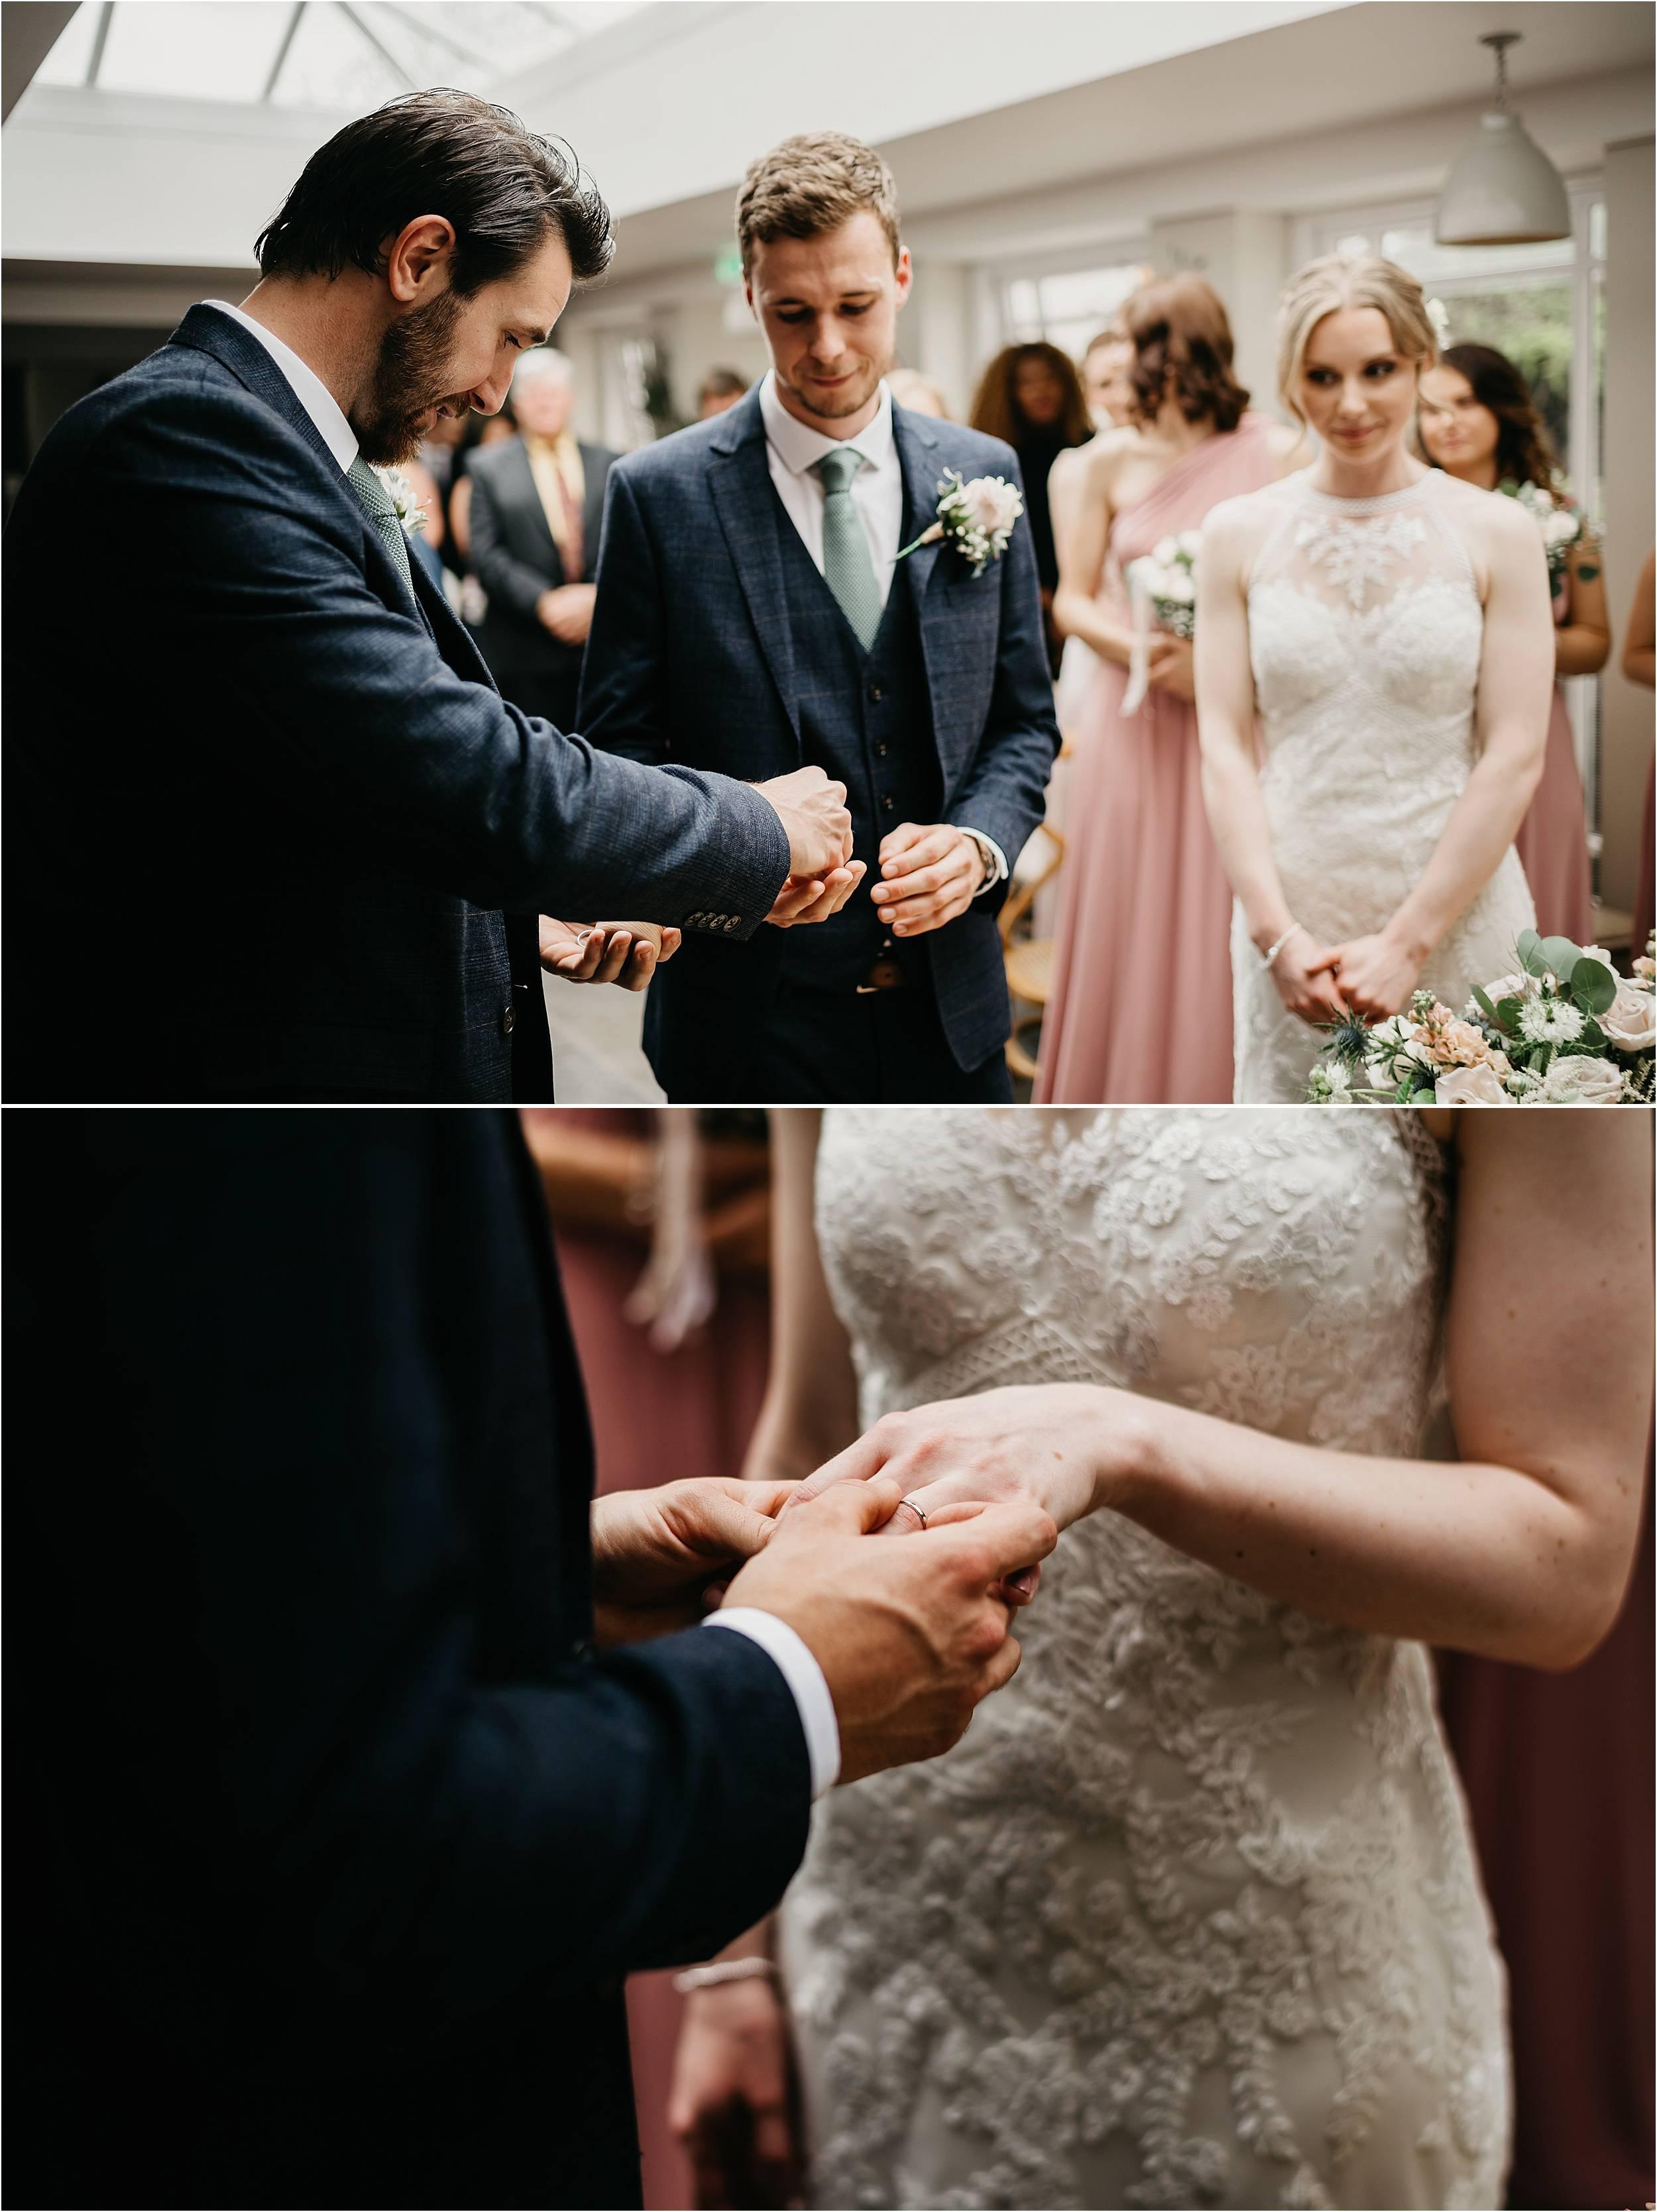 Kedleston Country House Wedding Photography_0049.jpg